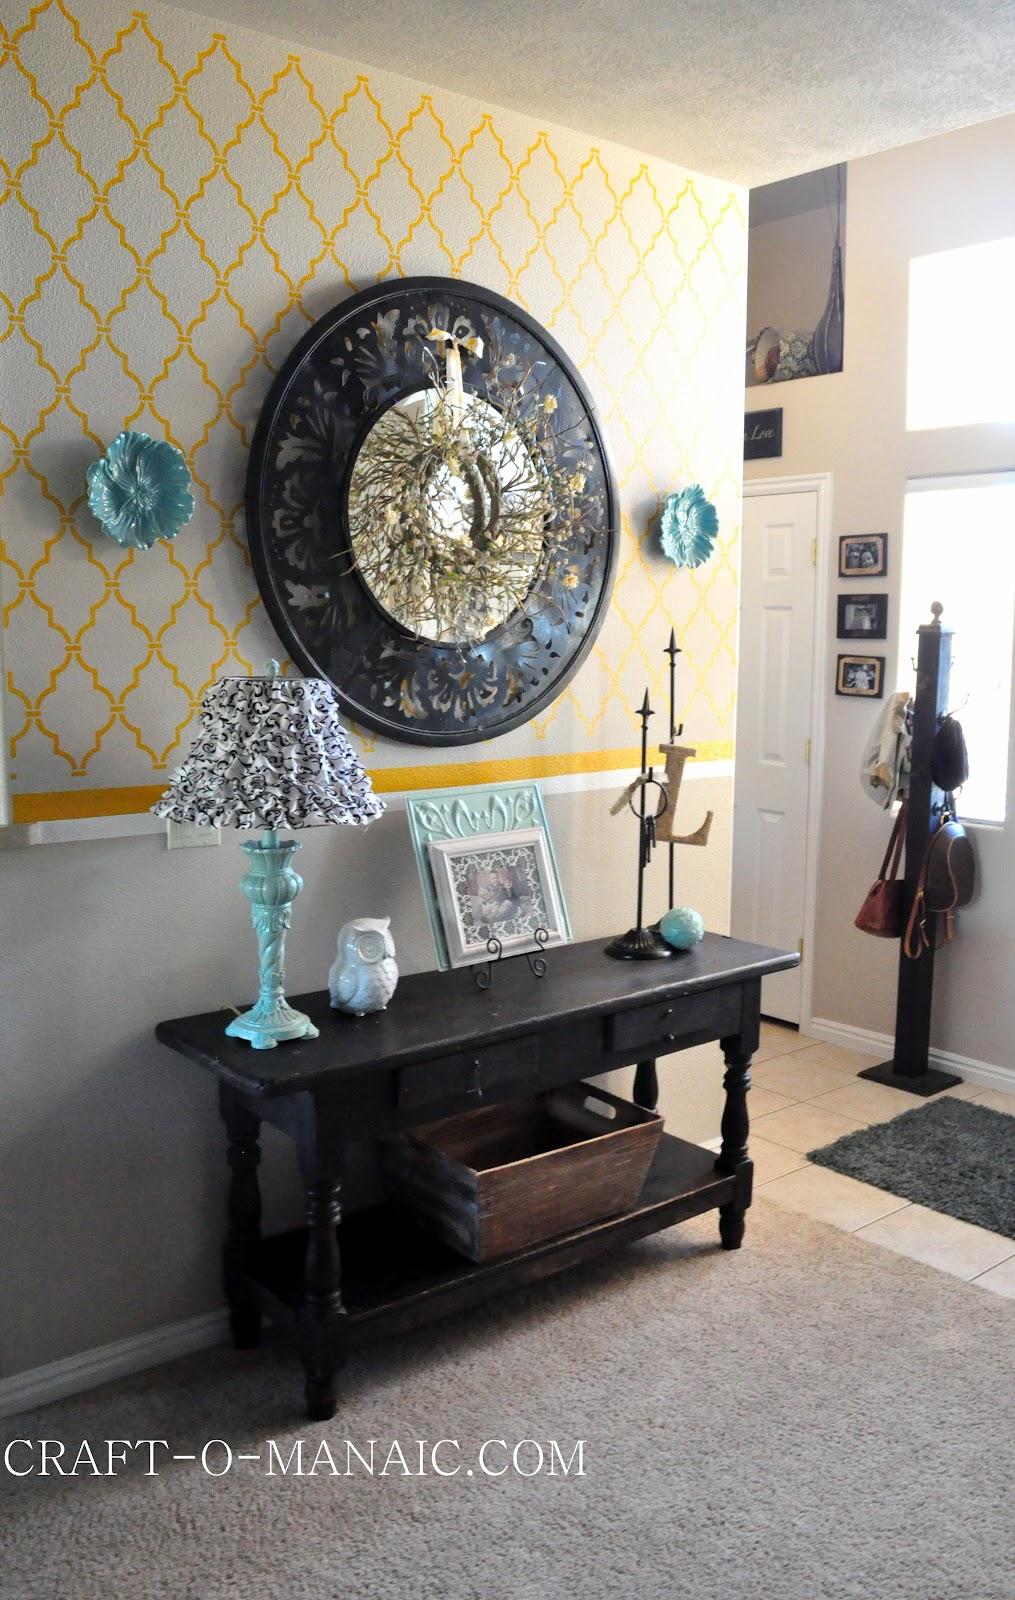 Foyer Table Craigslist : Home decor new entry table from craigslist craft o maniac